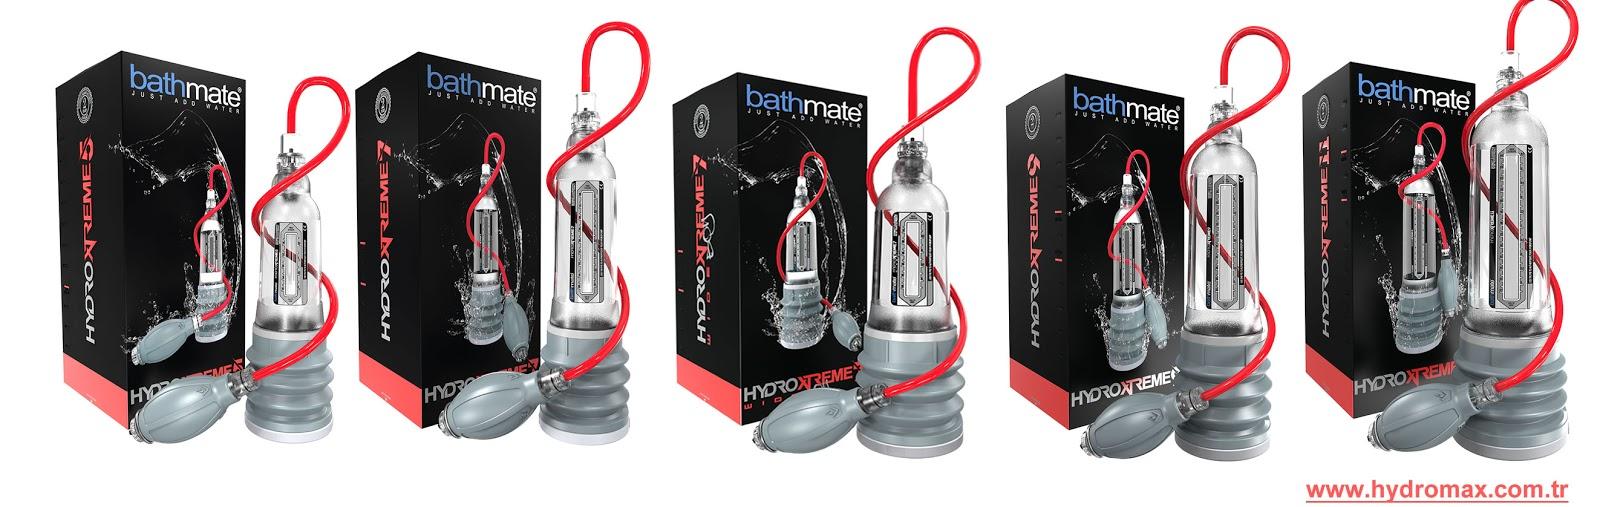 Bathmate Hydroxtreme series penis pump